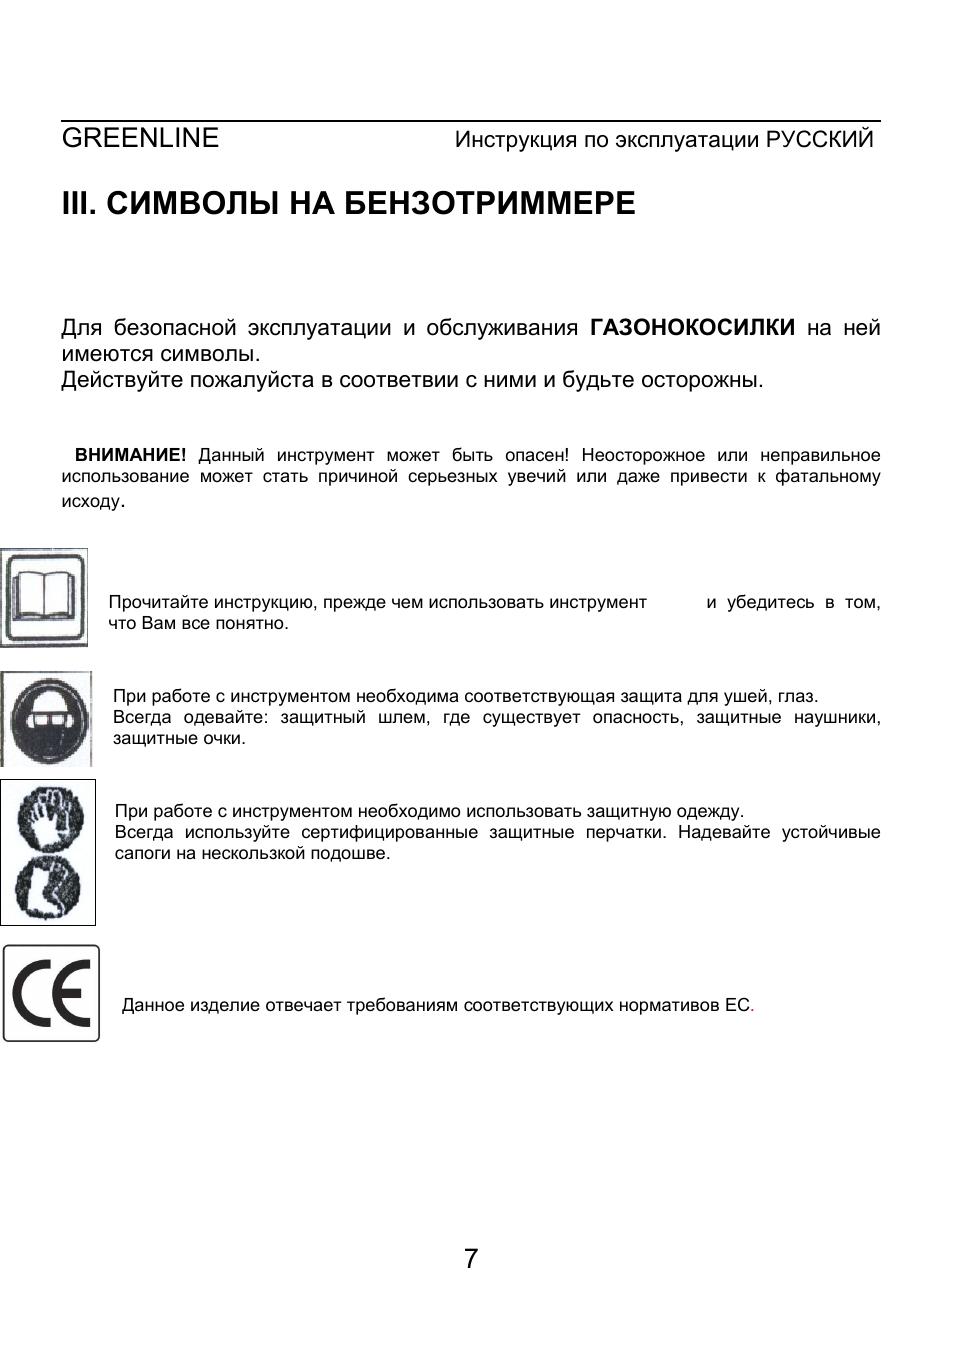 Iii. символы на бензотриммере, Greenline